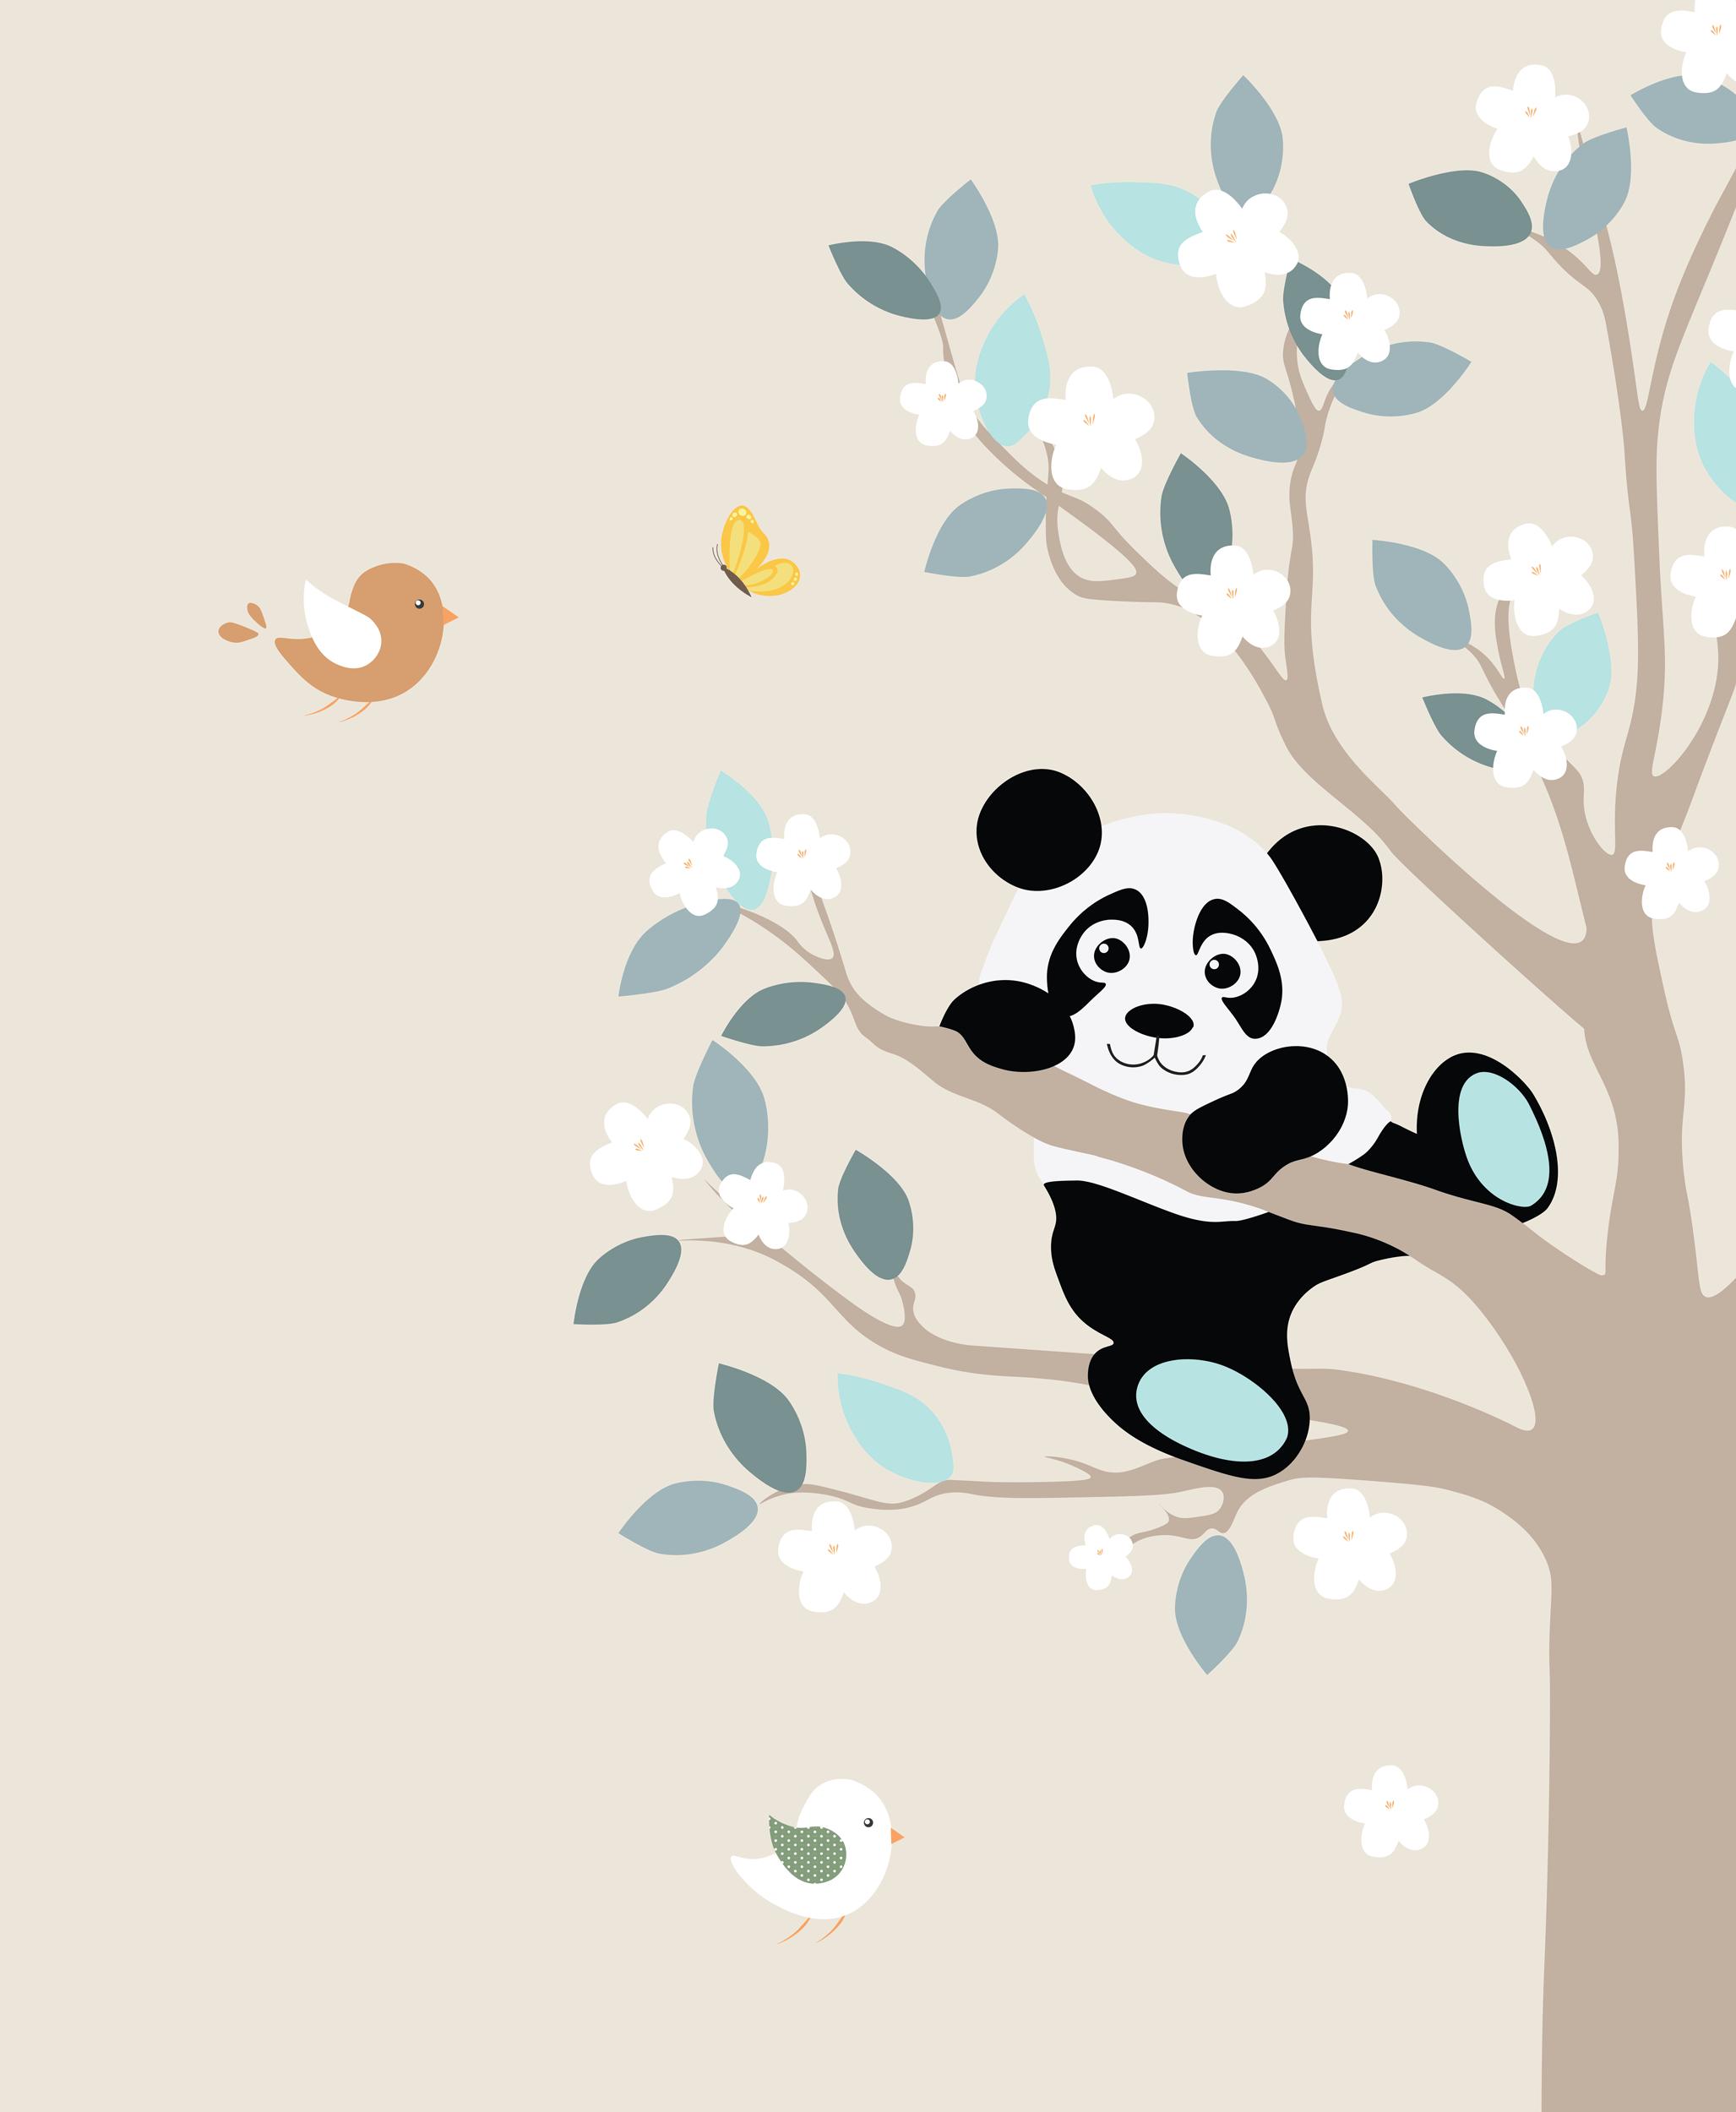 Download Panda Wallpaper Hd Backgrounds Download Itl Cat